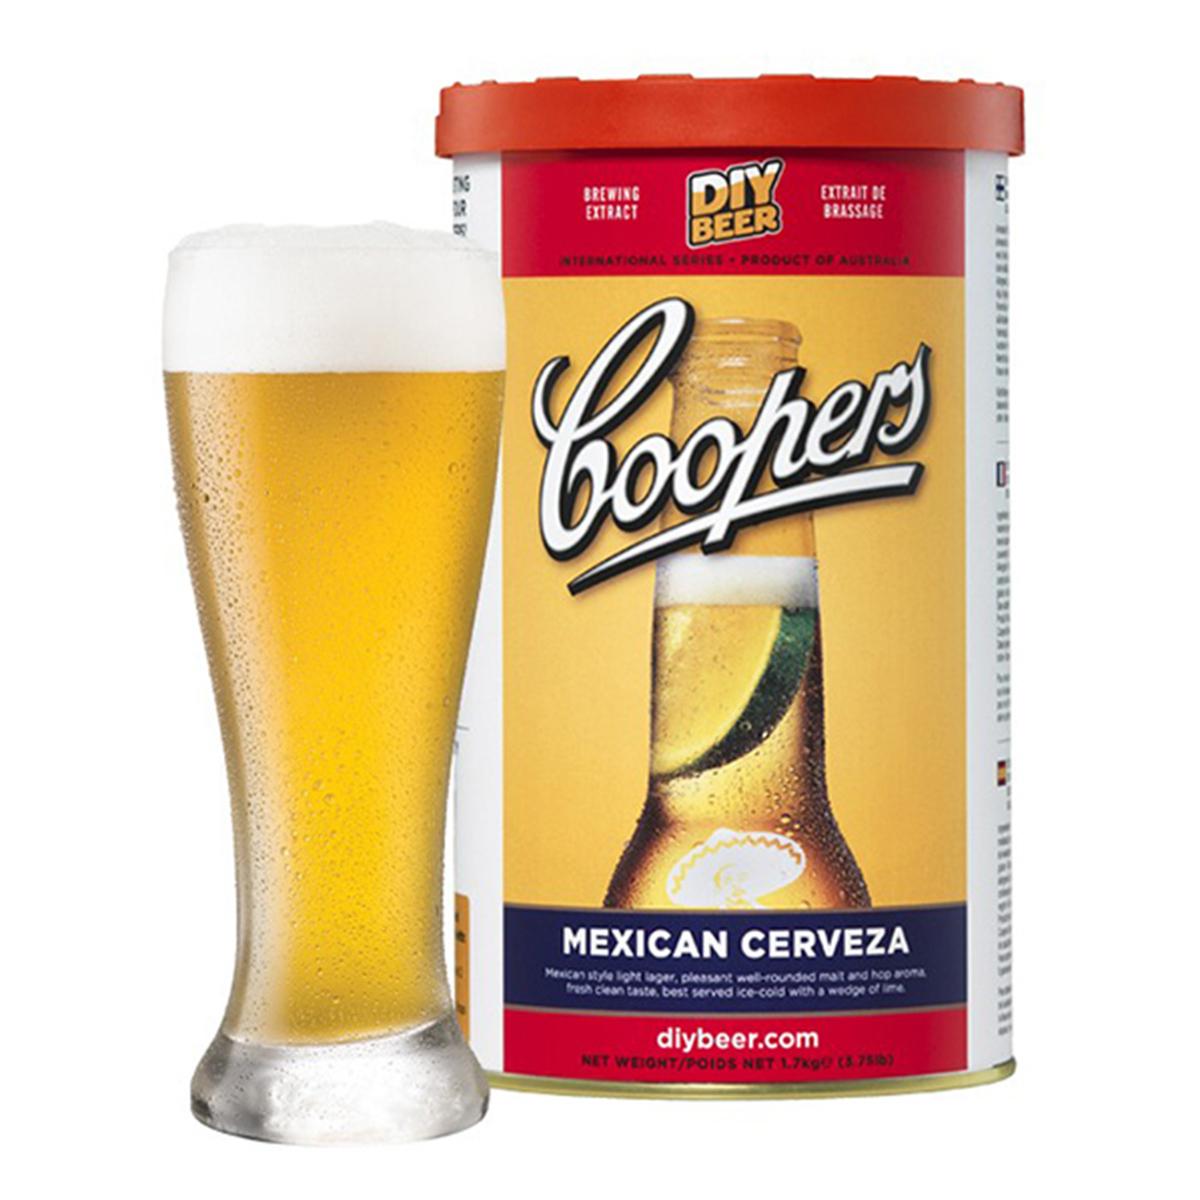 mexican-cerveza-_-glass-1475024338